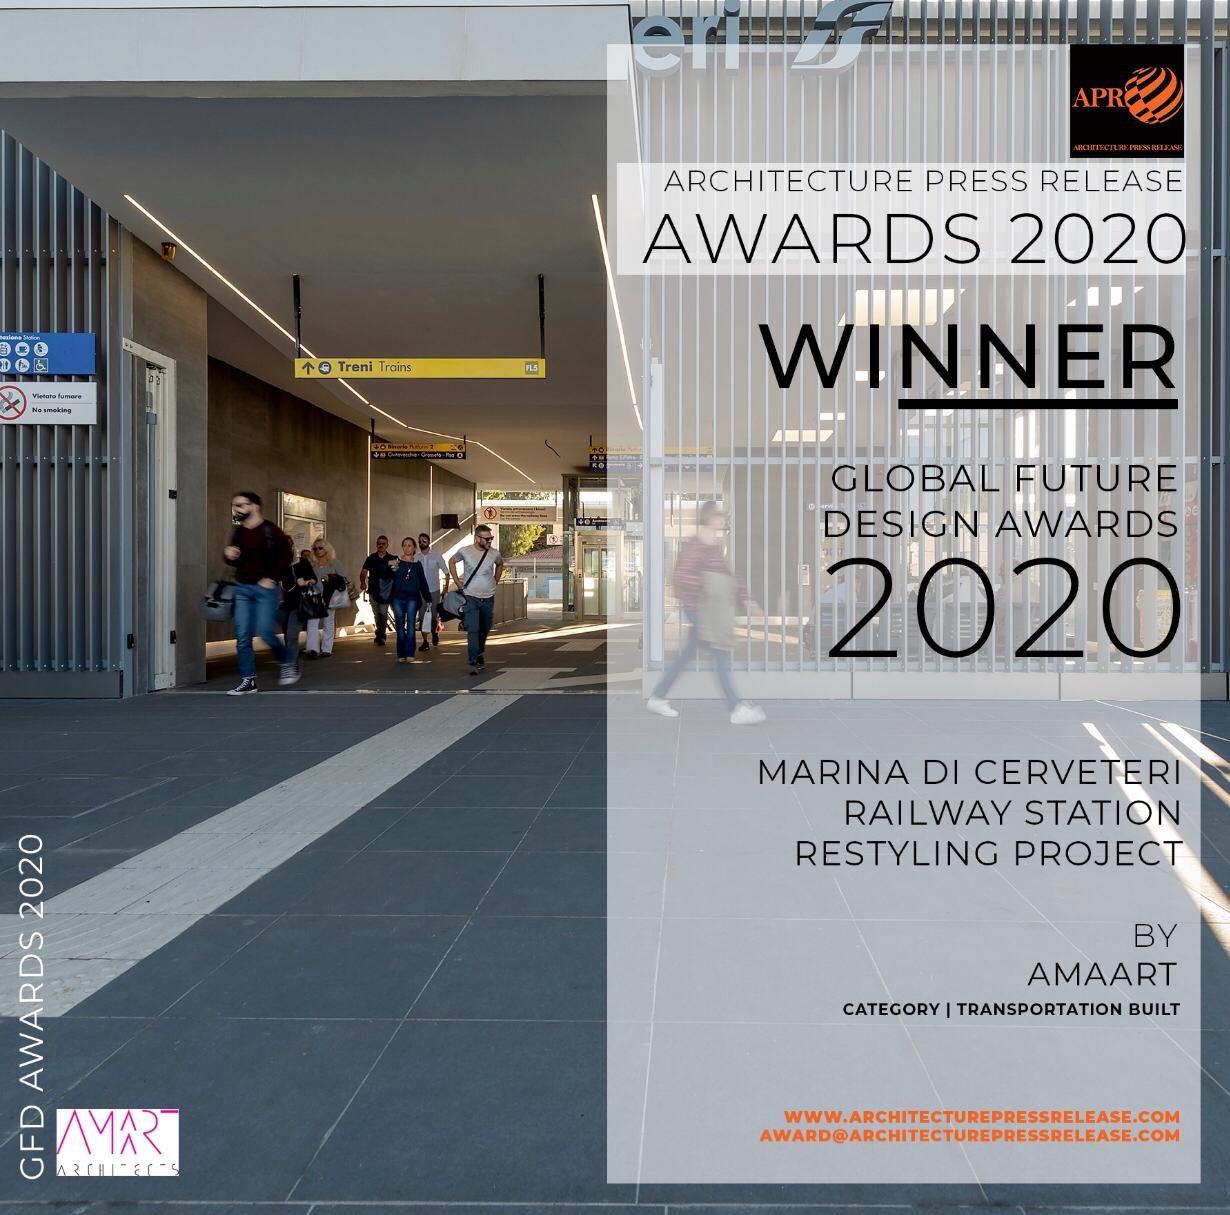 Winner Award 2020 - APR - GFDA